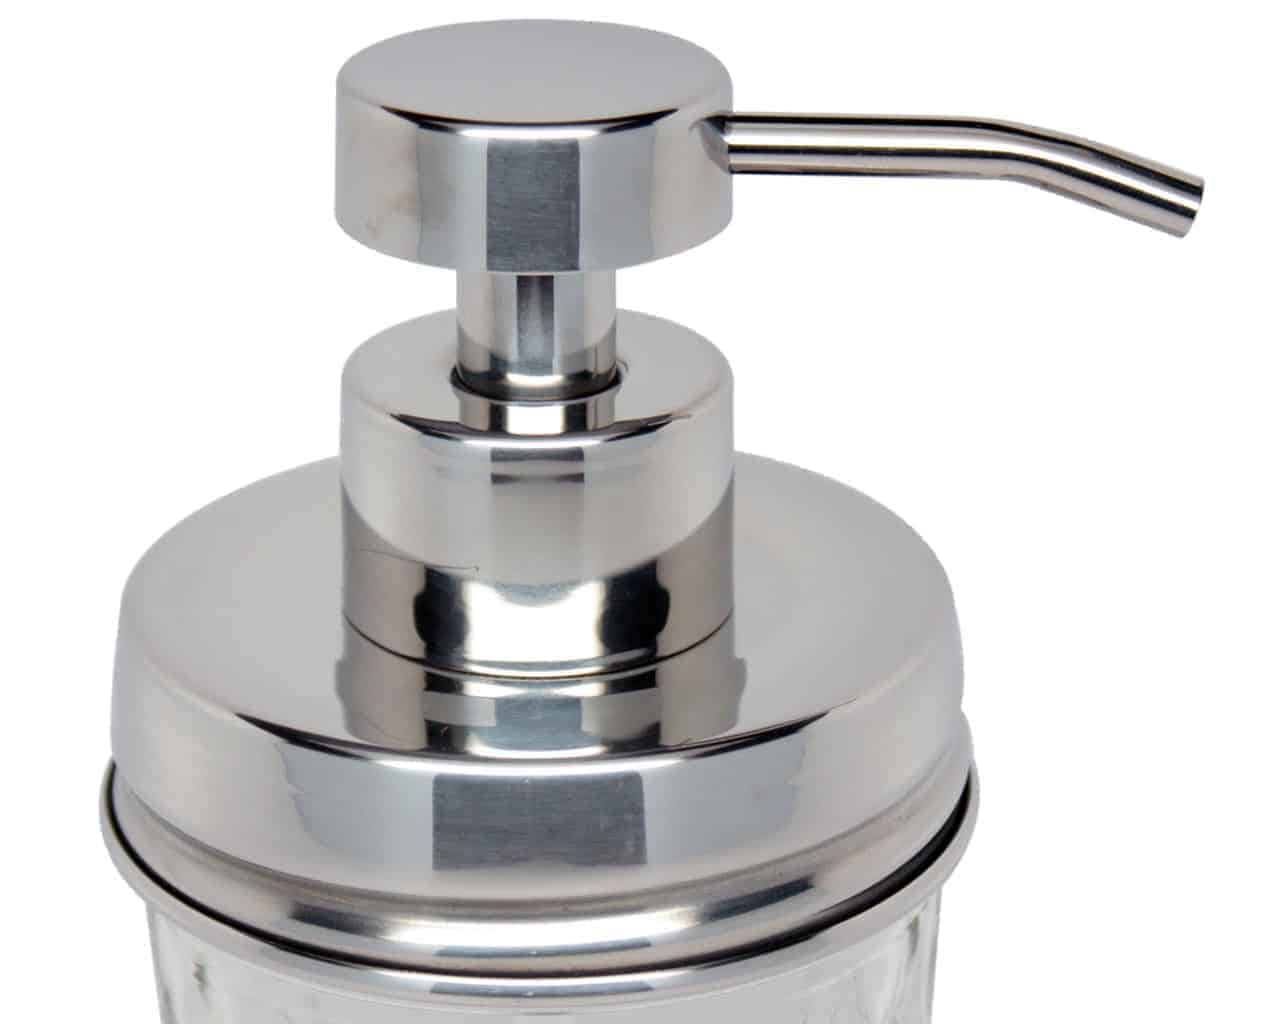 Mirror Chrome Soap Pump Dispenser Lid Adapter For Rm Mason